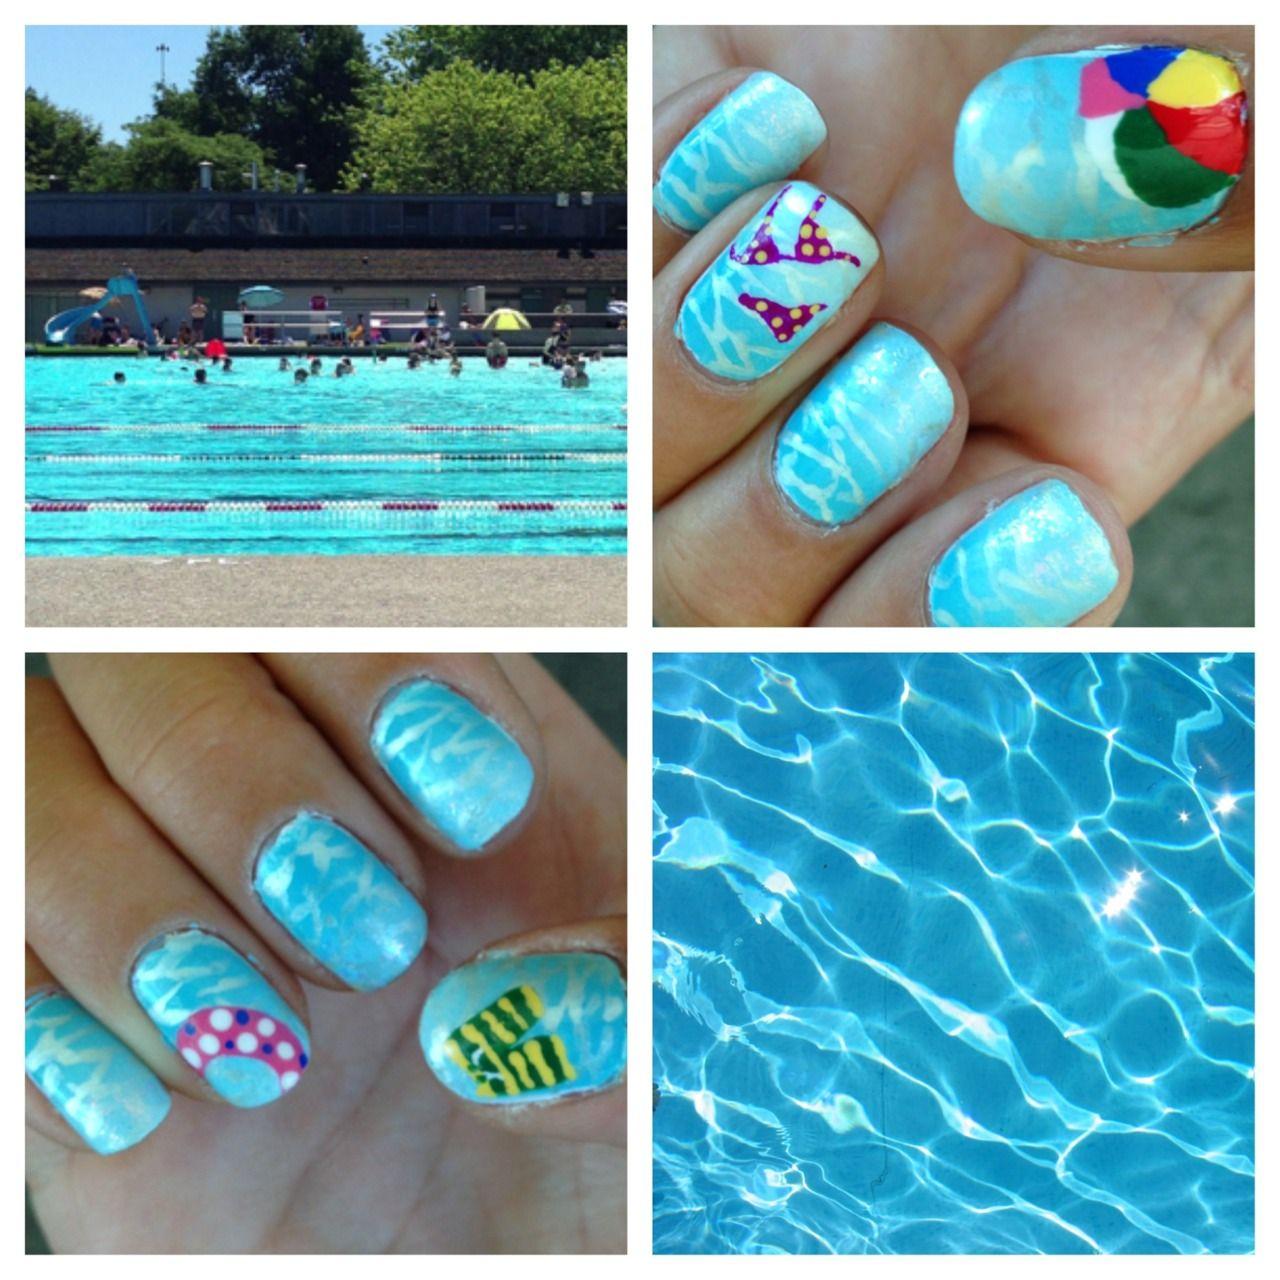 Pool Nails Blue Ombre Water Nail Art Bikini Beach Ball Shorts